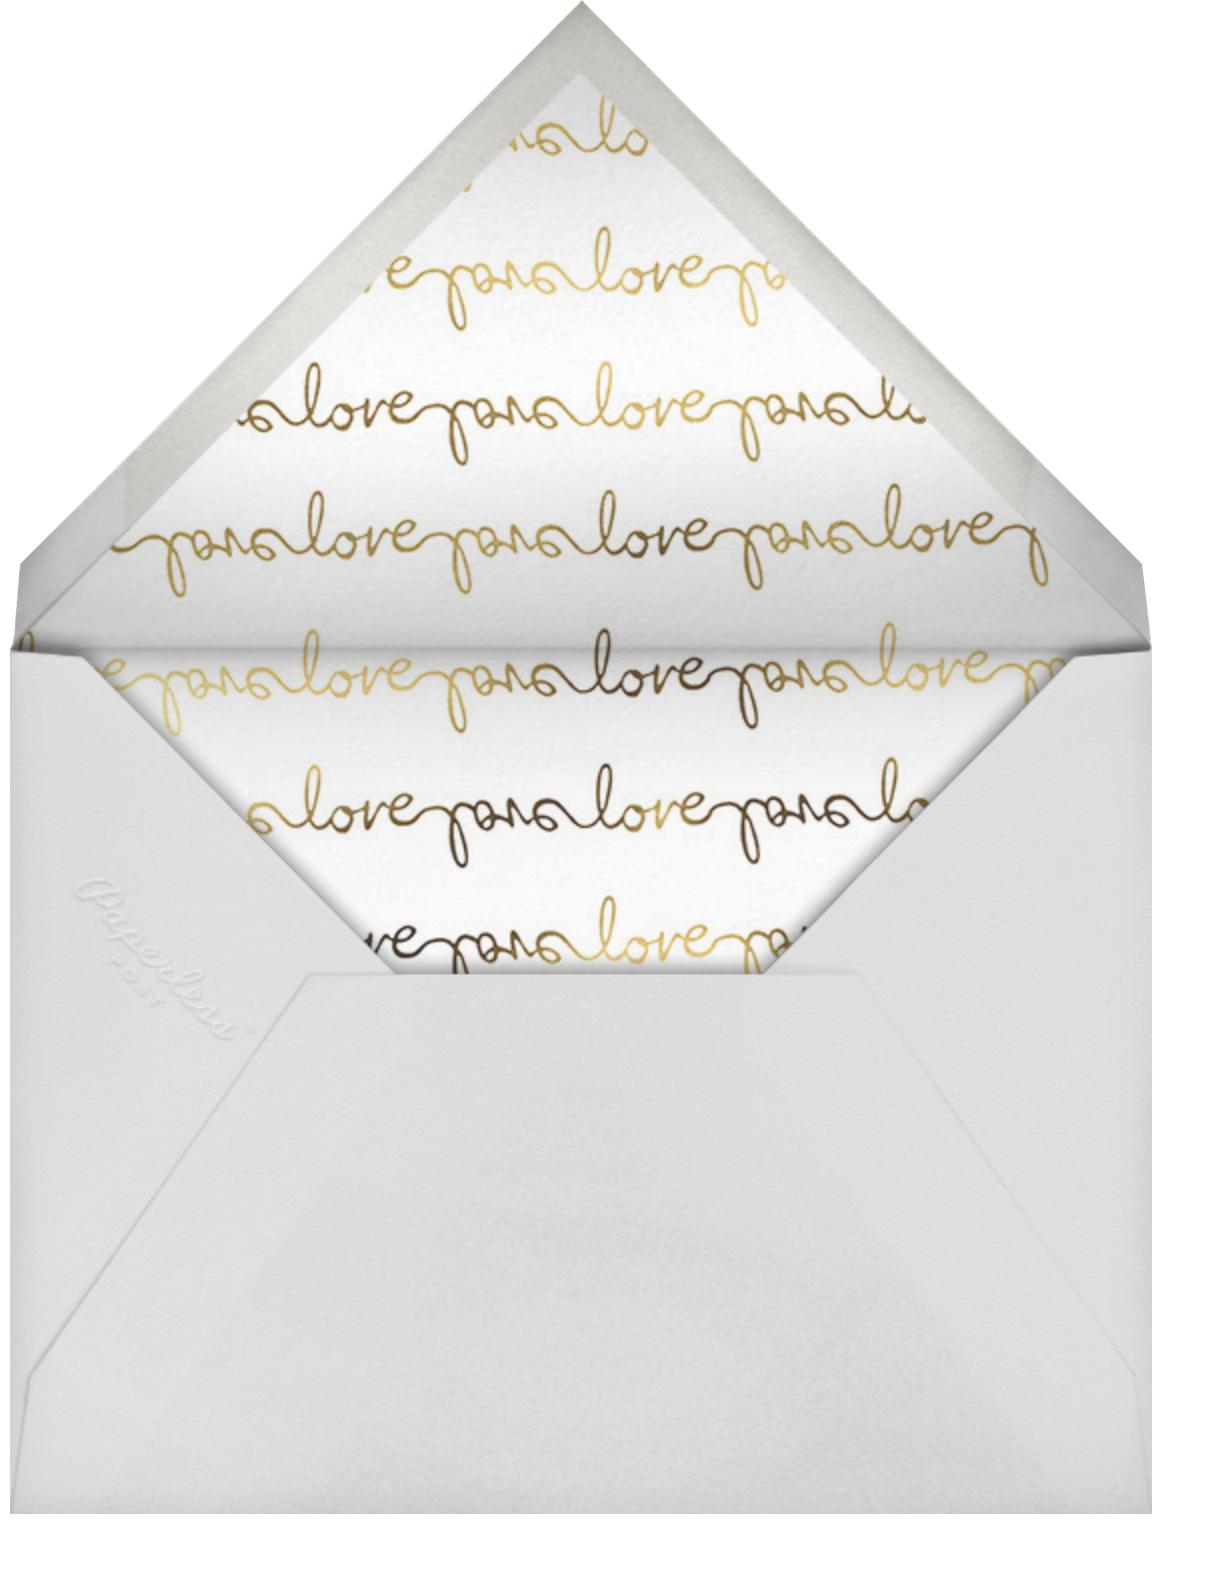 Third's a Charm - Pavlova - kate spade new york - Engagement party - envelope back